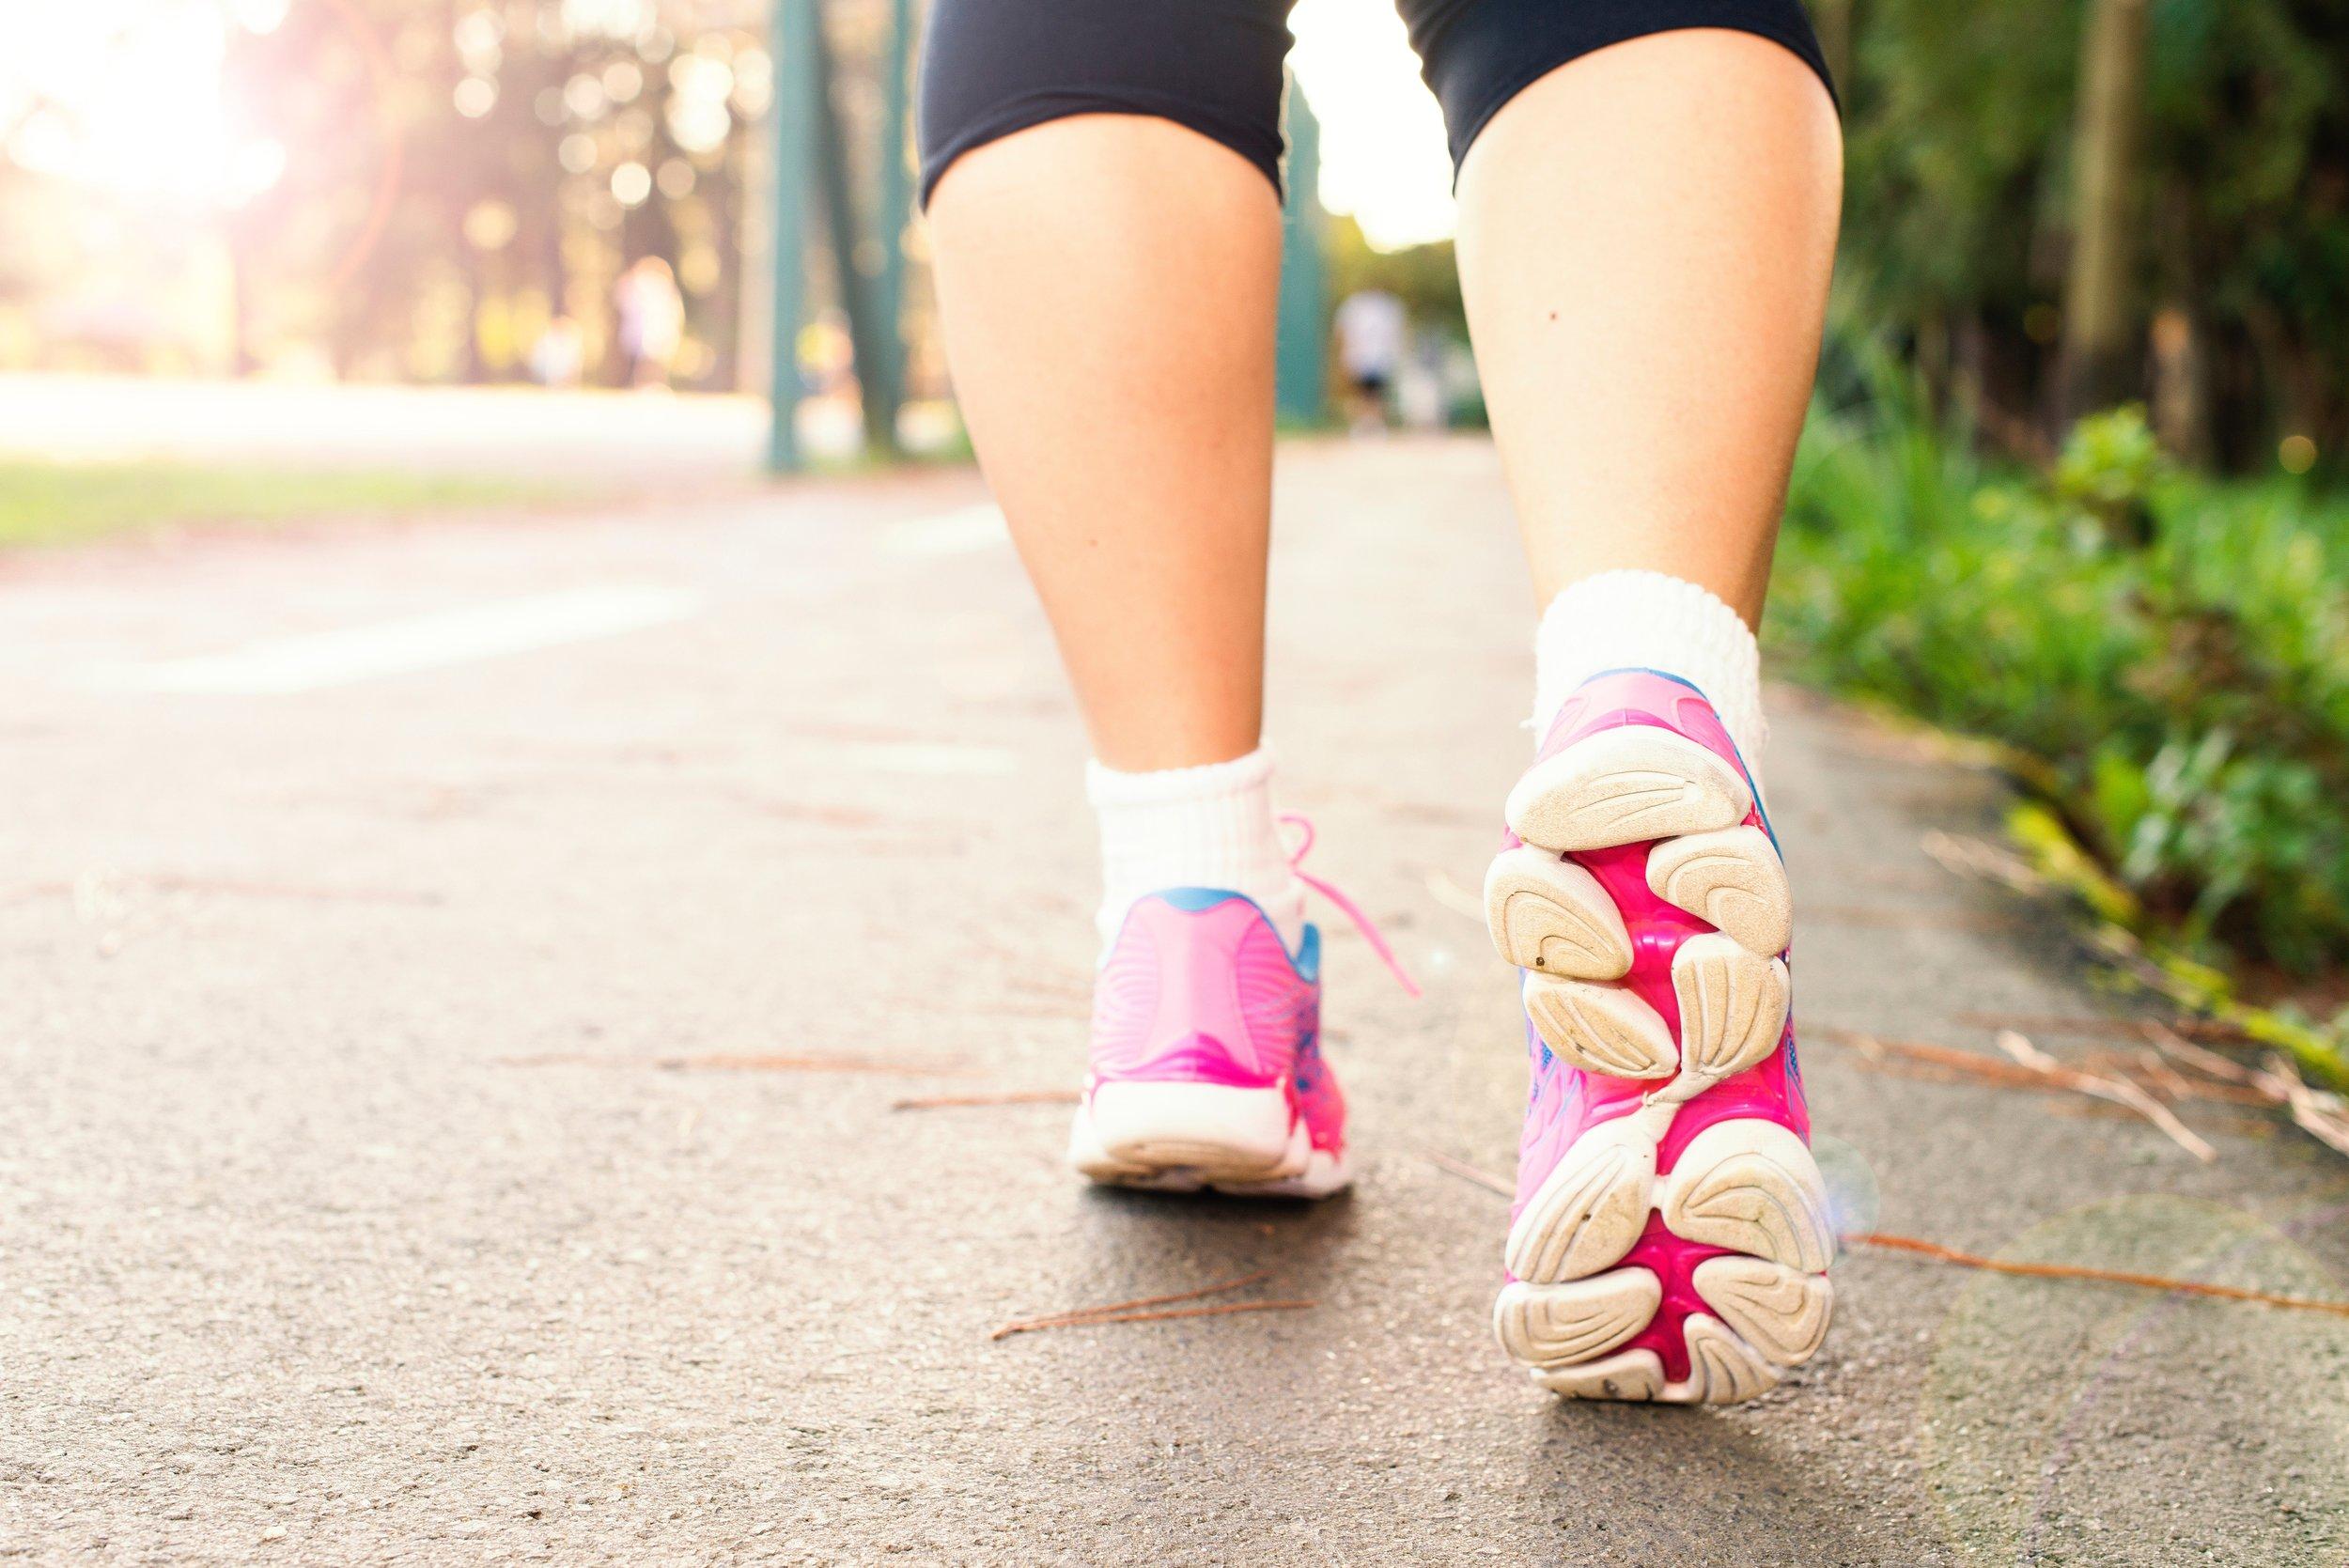 activity-exercise-fitness-1556710.jpg